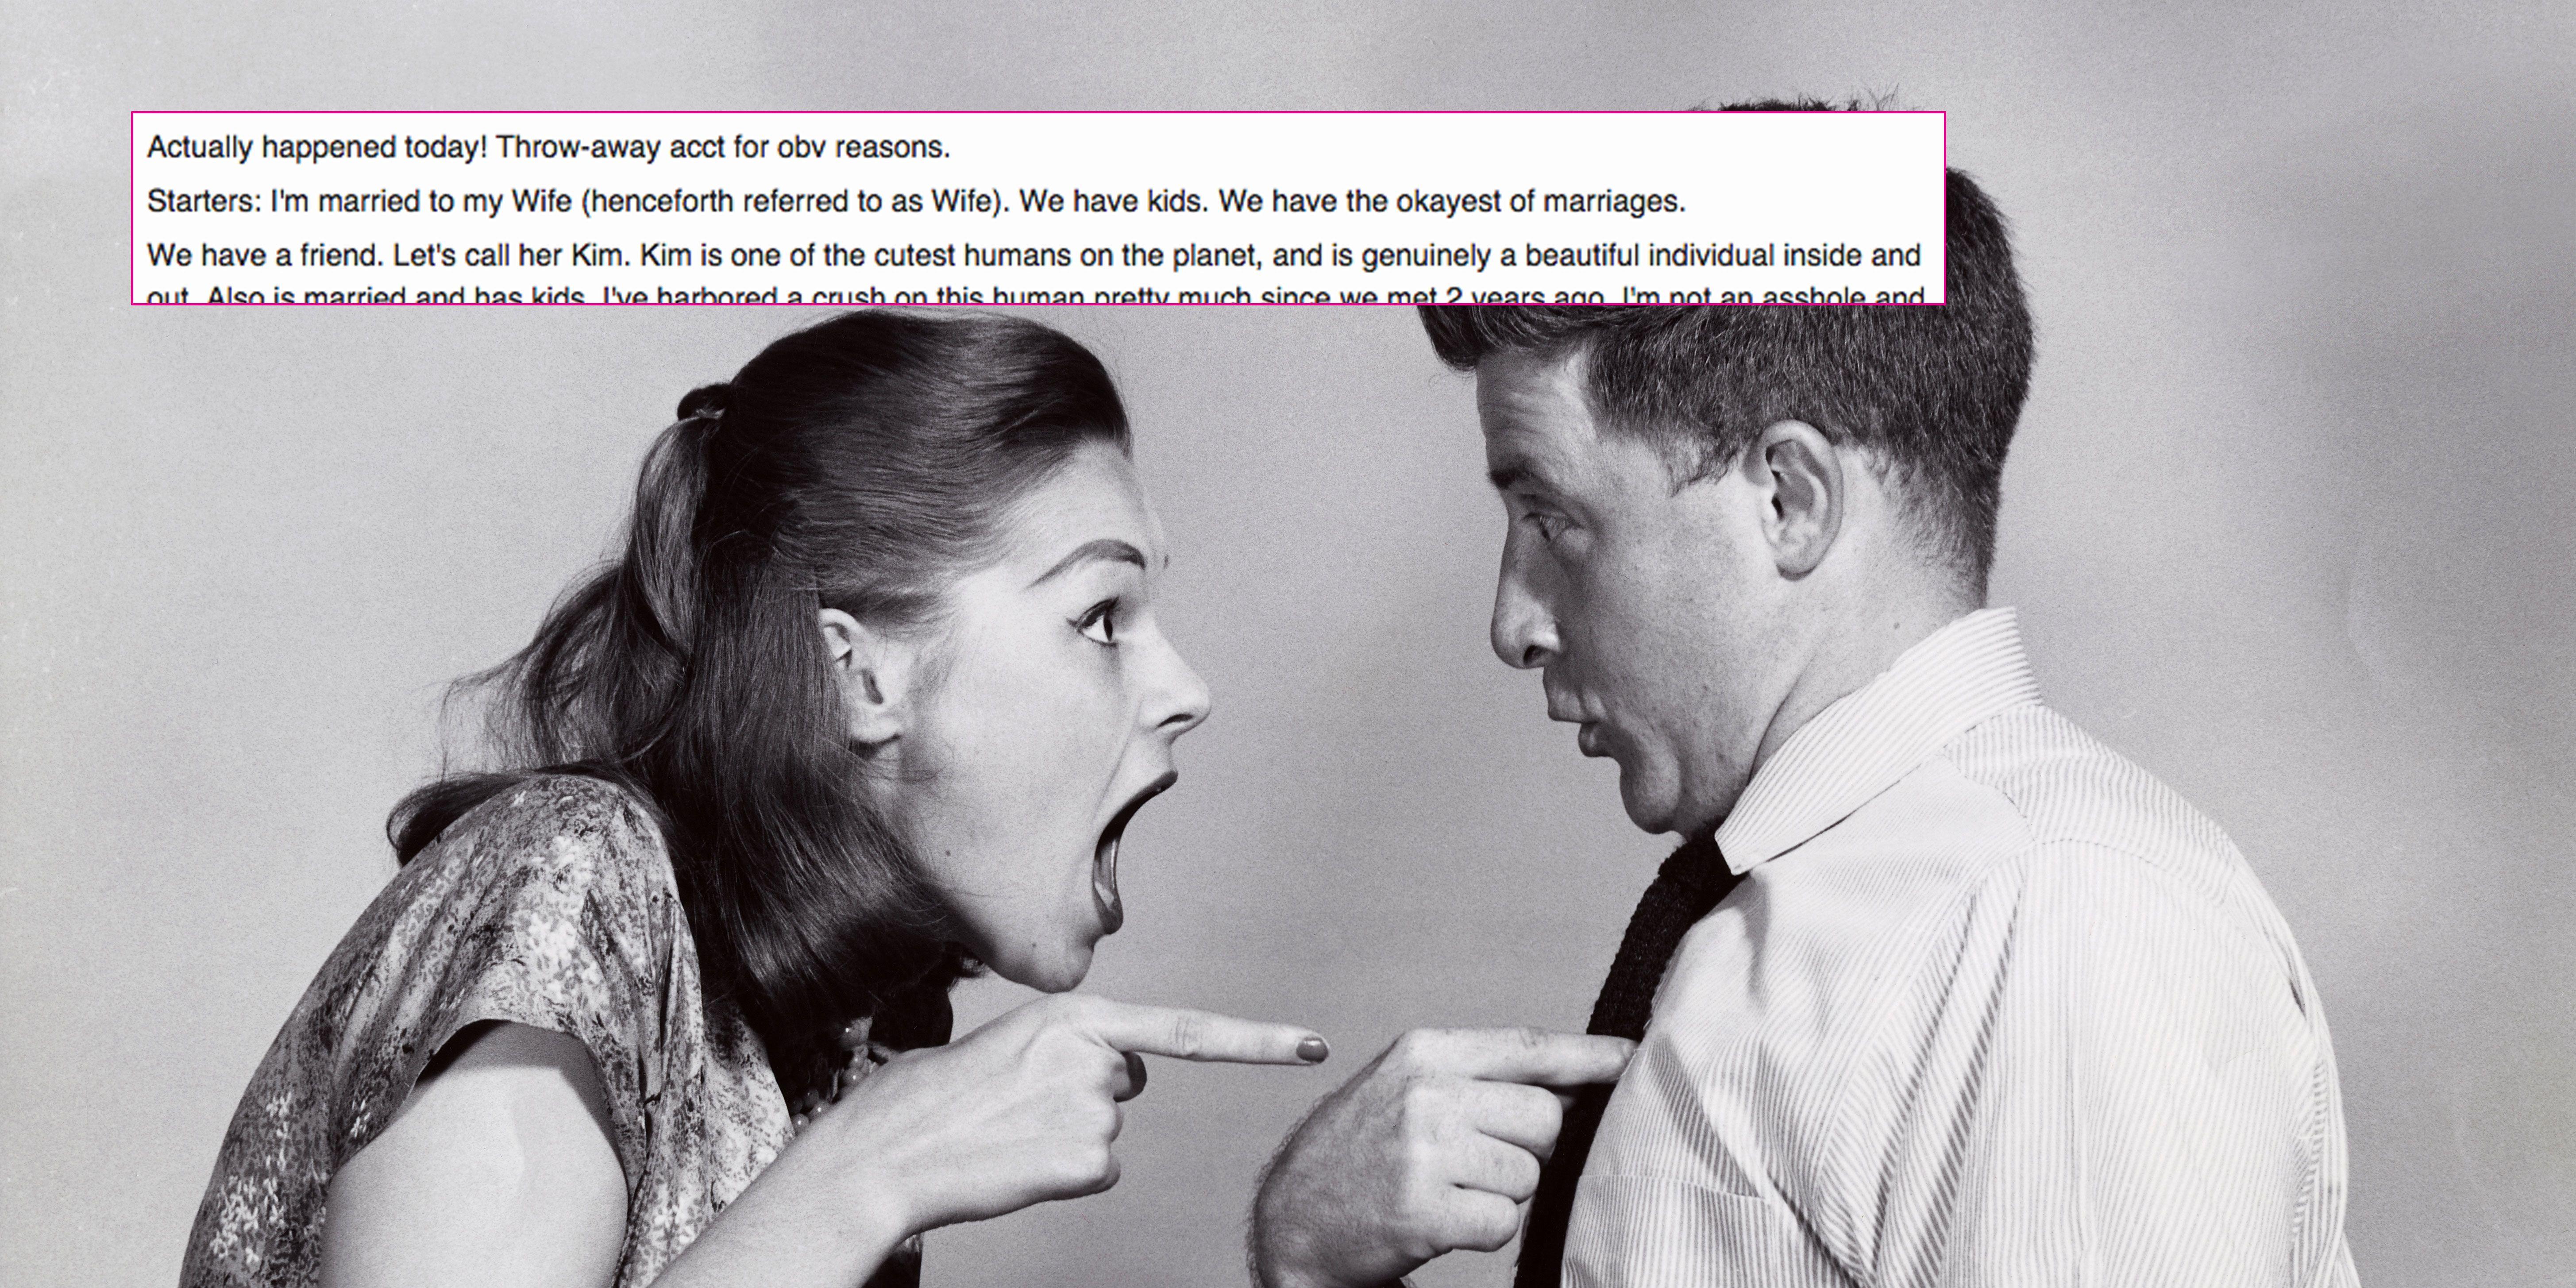 Man Tells Wife He Has Crush On Their Friend